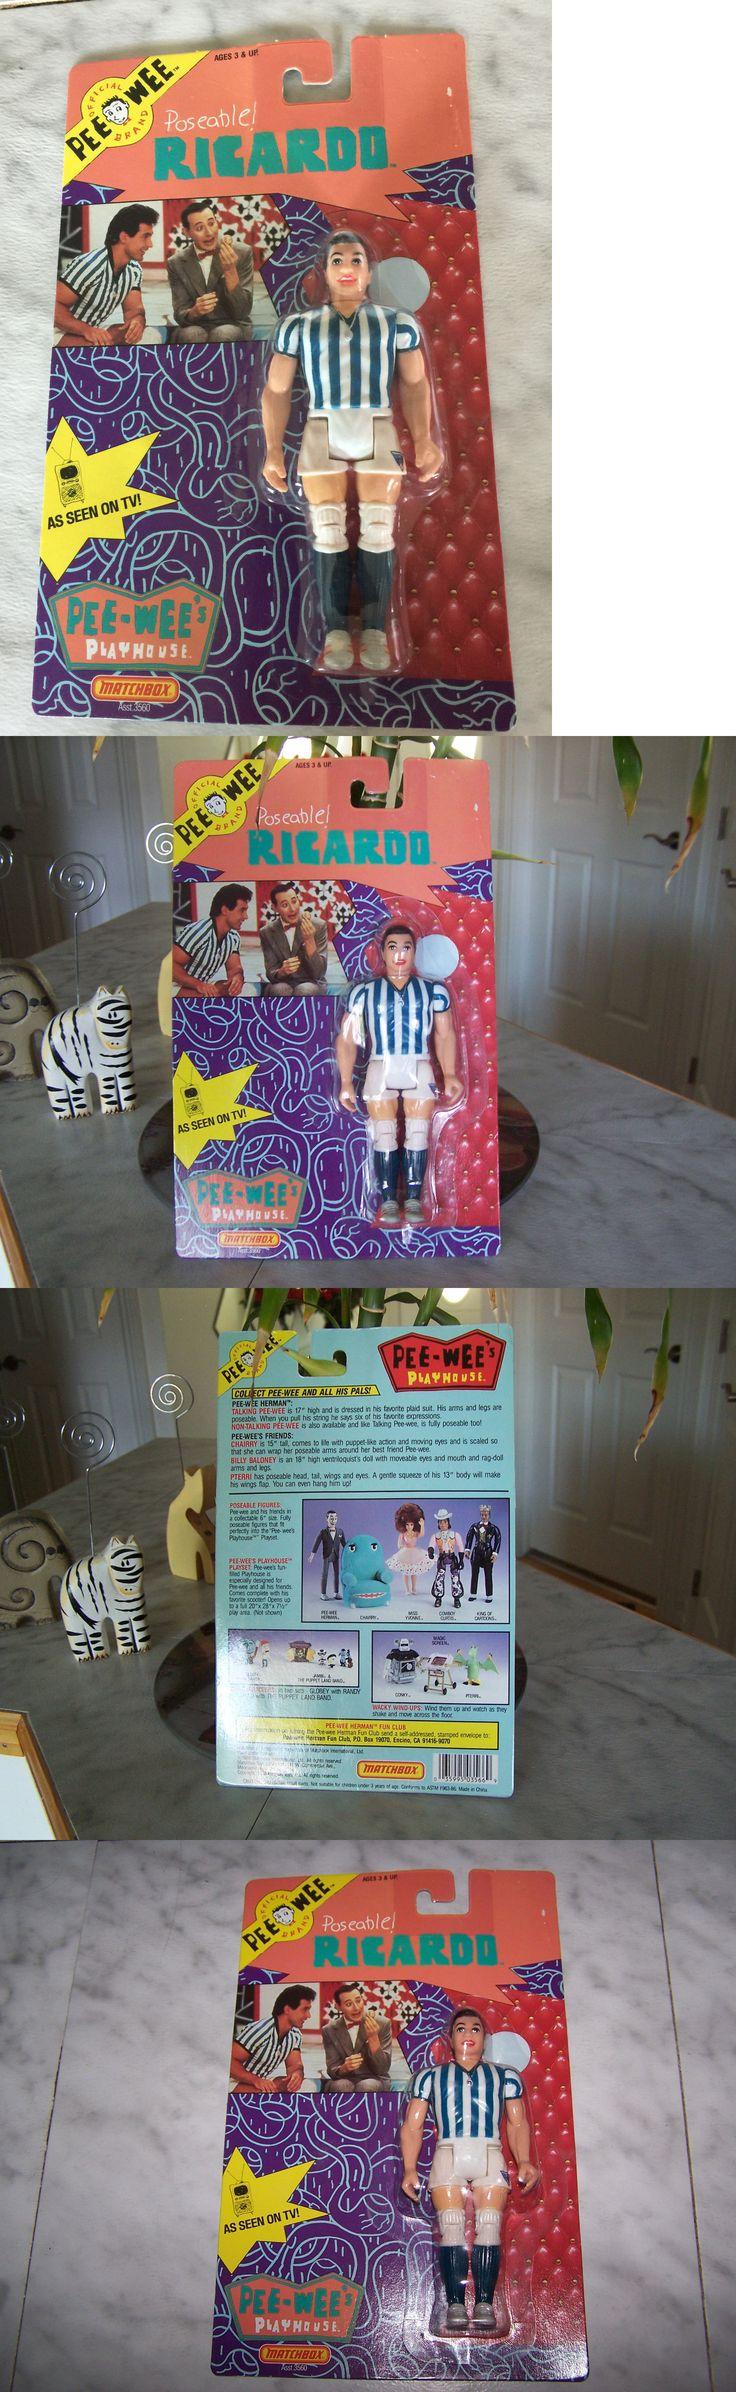 Pee-Wee Herman 20917: 1988 Pee Wee Playhouse Poseable Richardo Matchbox (New) -> BUY IT NOW ONLY: $49.99 on eBay!